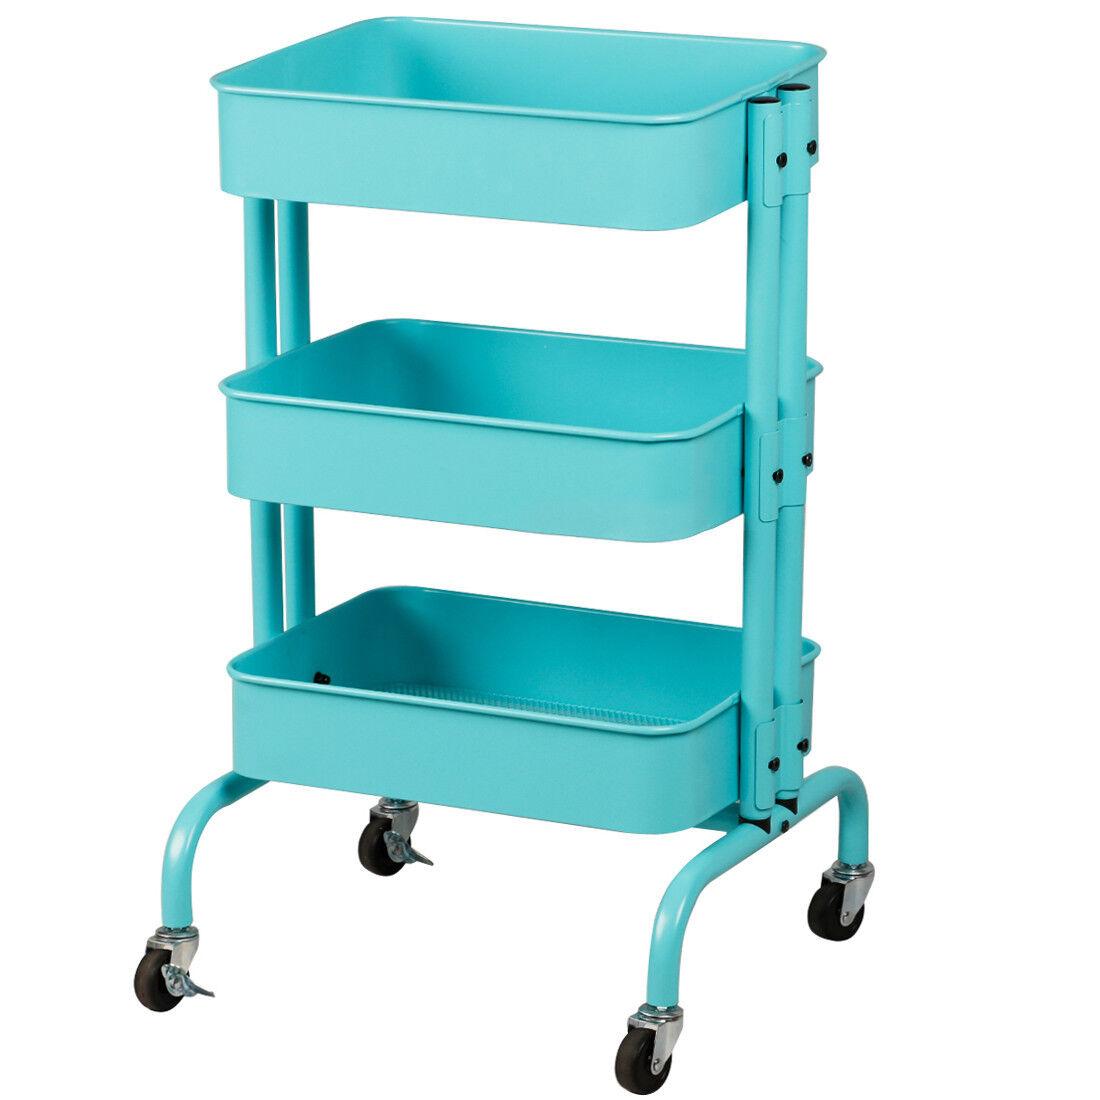 Kitchen Bedroom Bathroom Trolley 3 Tier Storage With Wheels | eBay